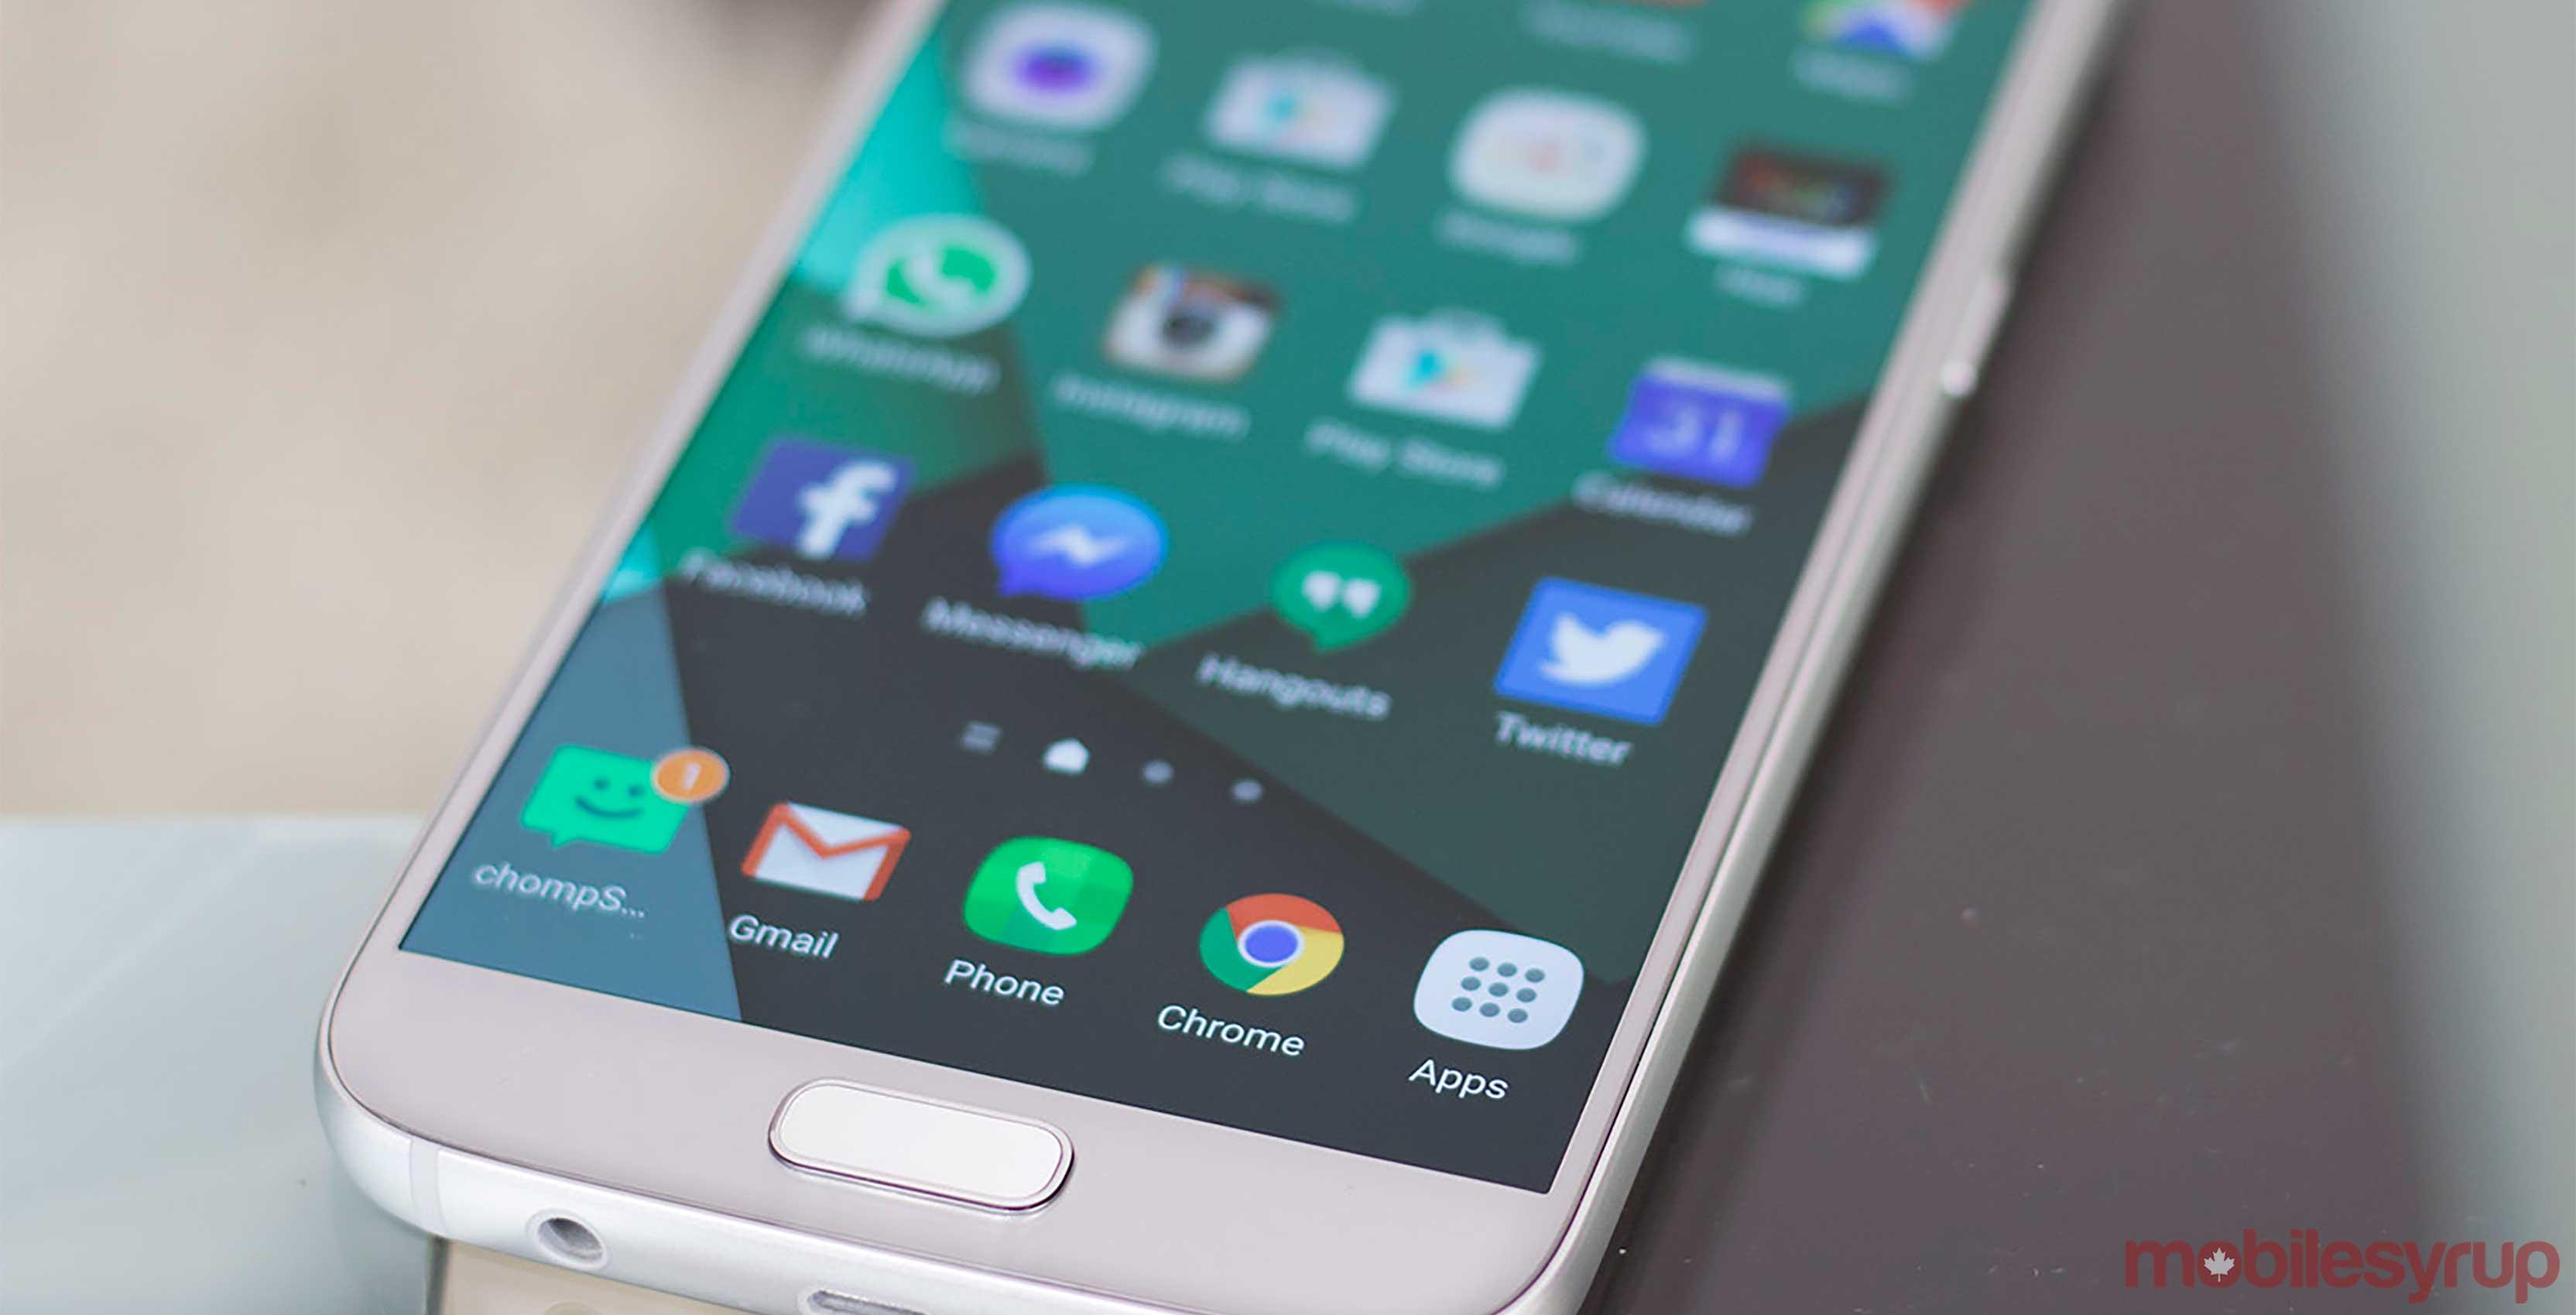 Samsung Galaxy S7 smartphone - Galaxy S8 Bixby